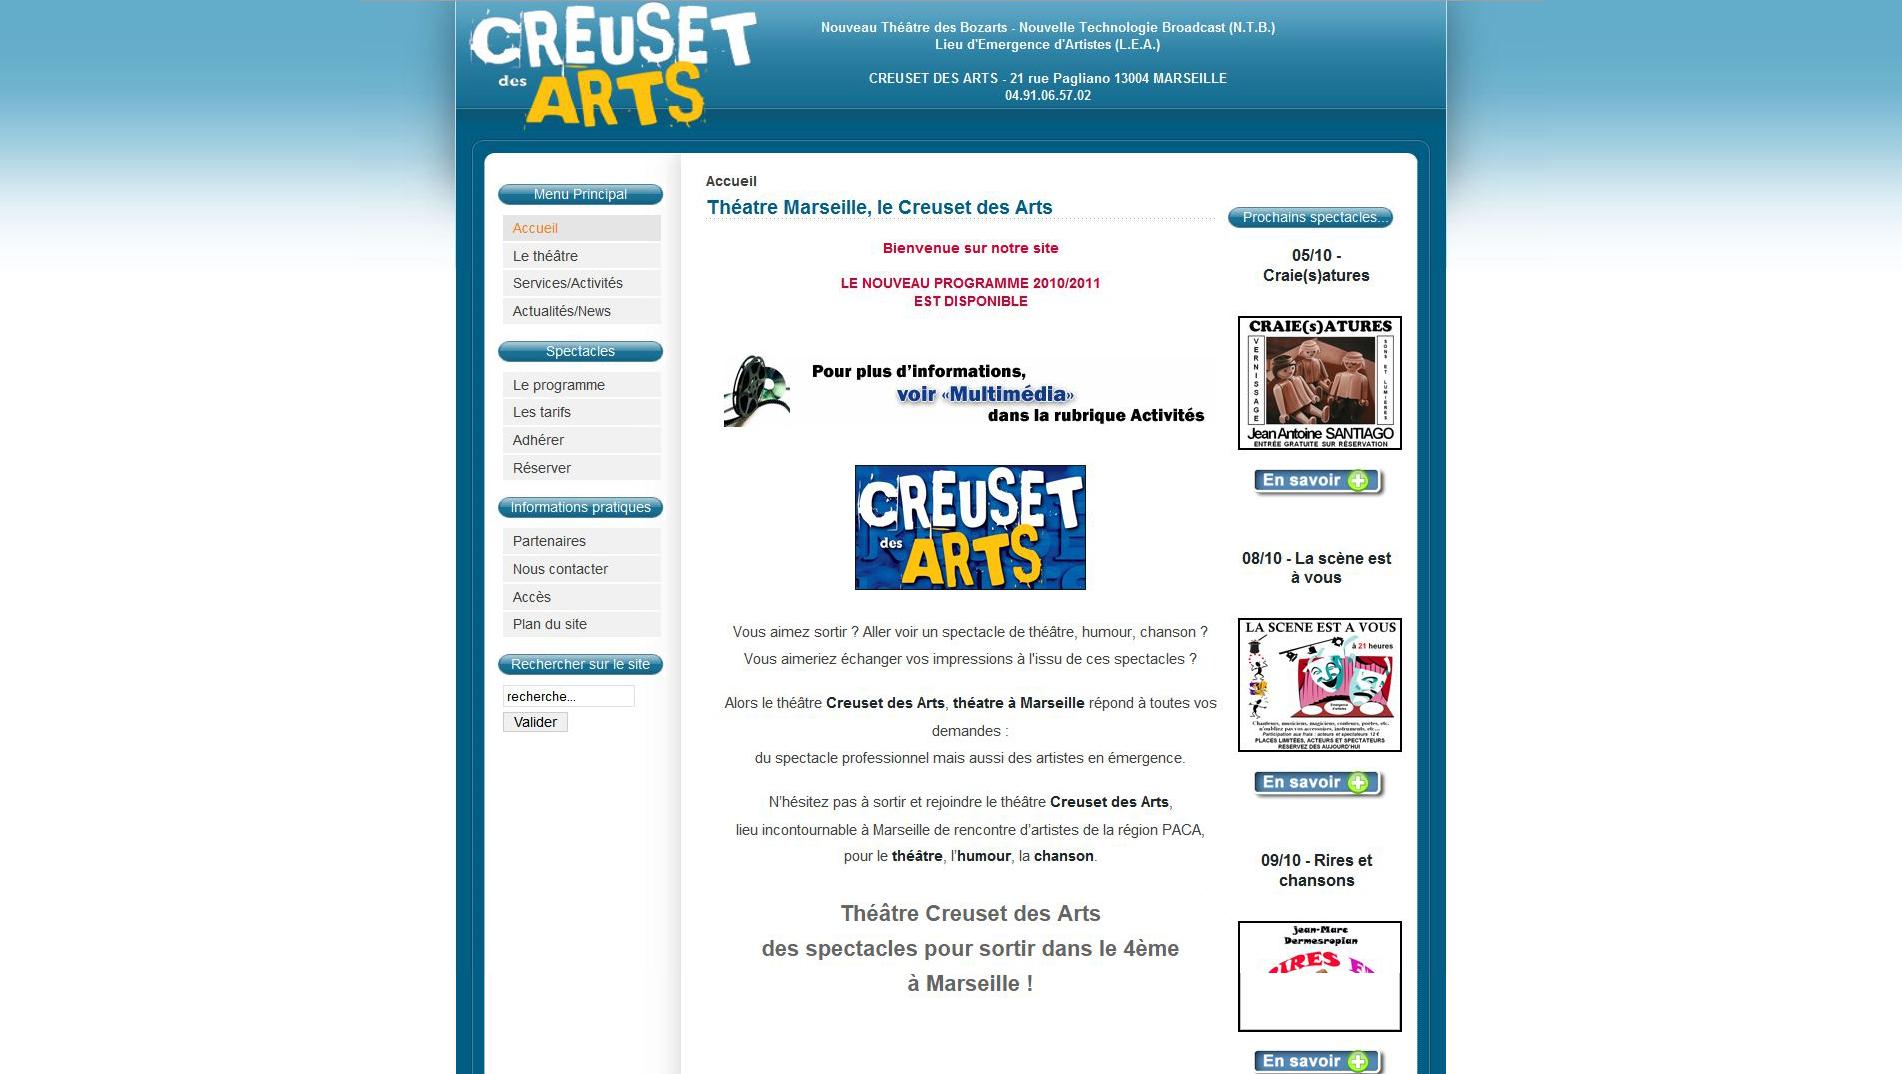 Capture-CreusetdesArts-2010